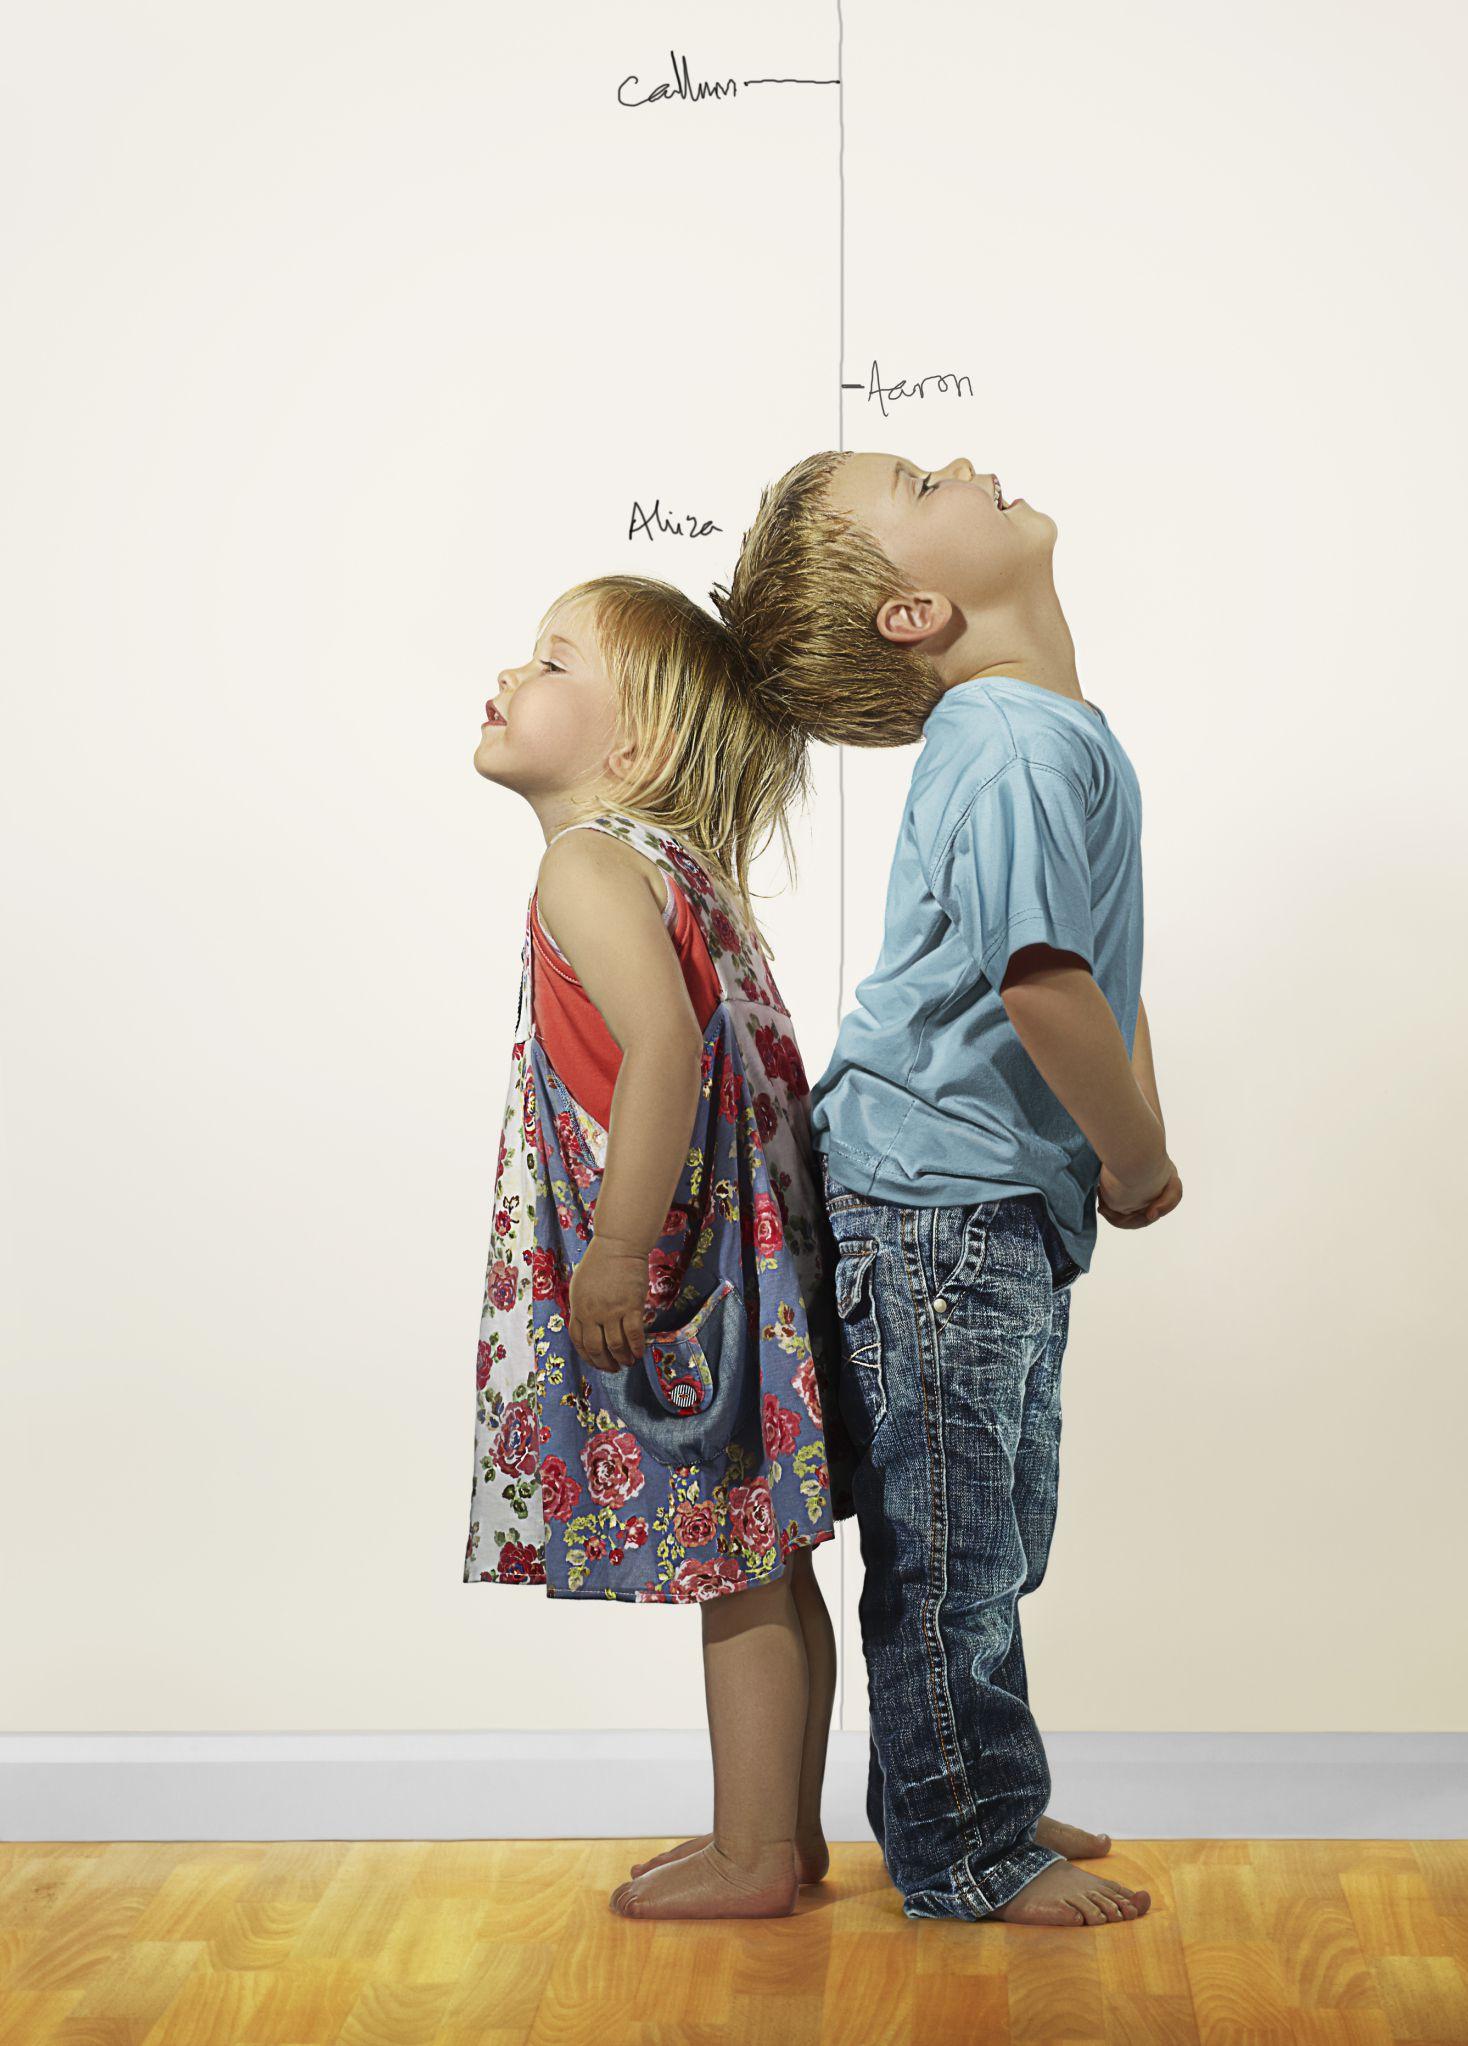 How Should We Teach Kids Units Of Measurement